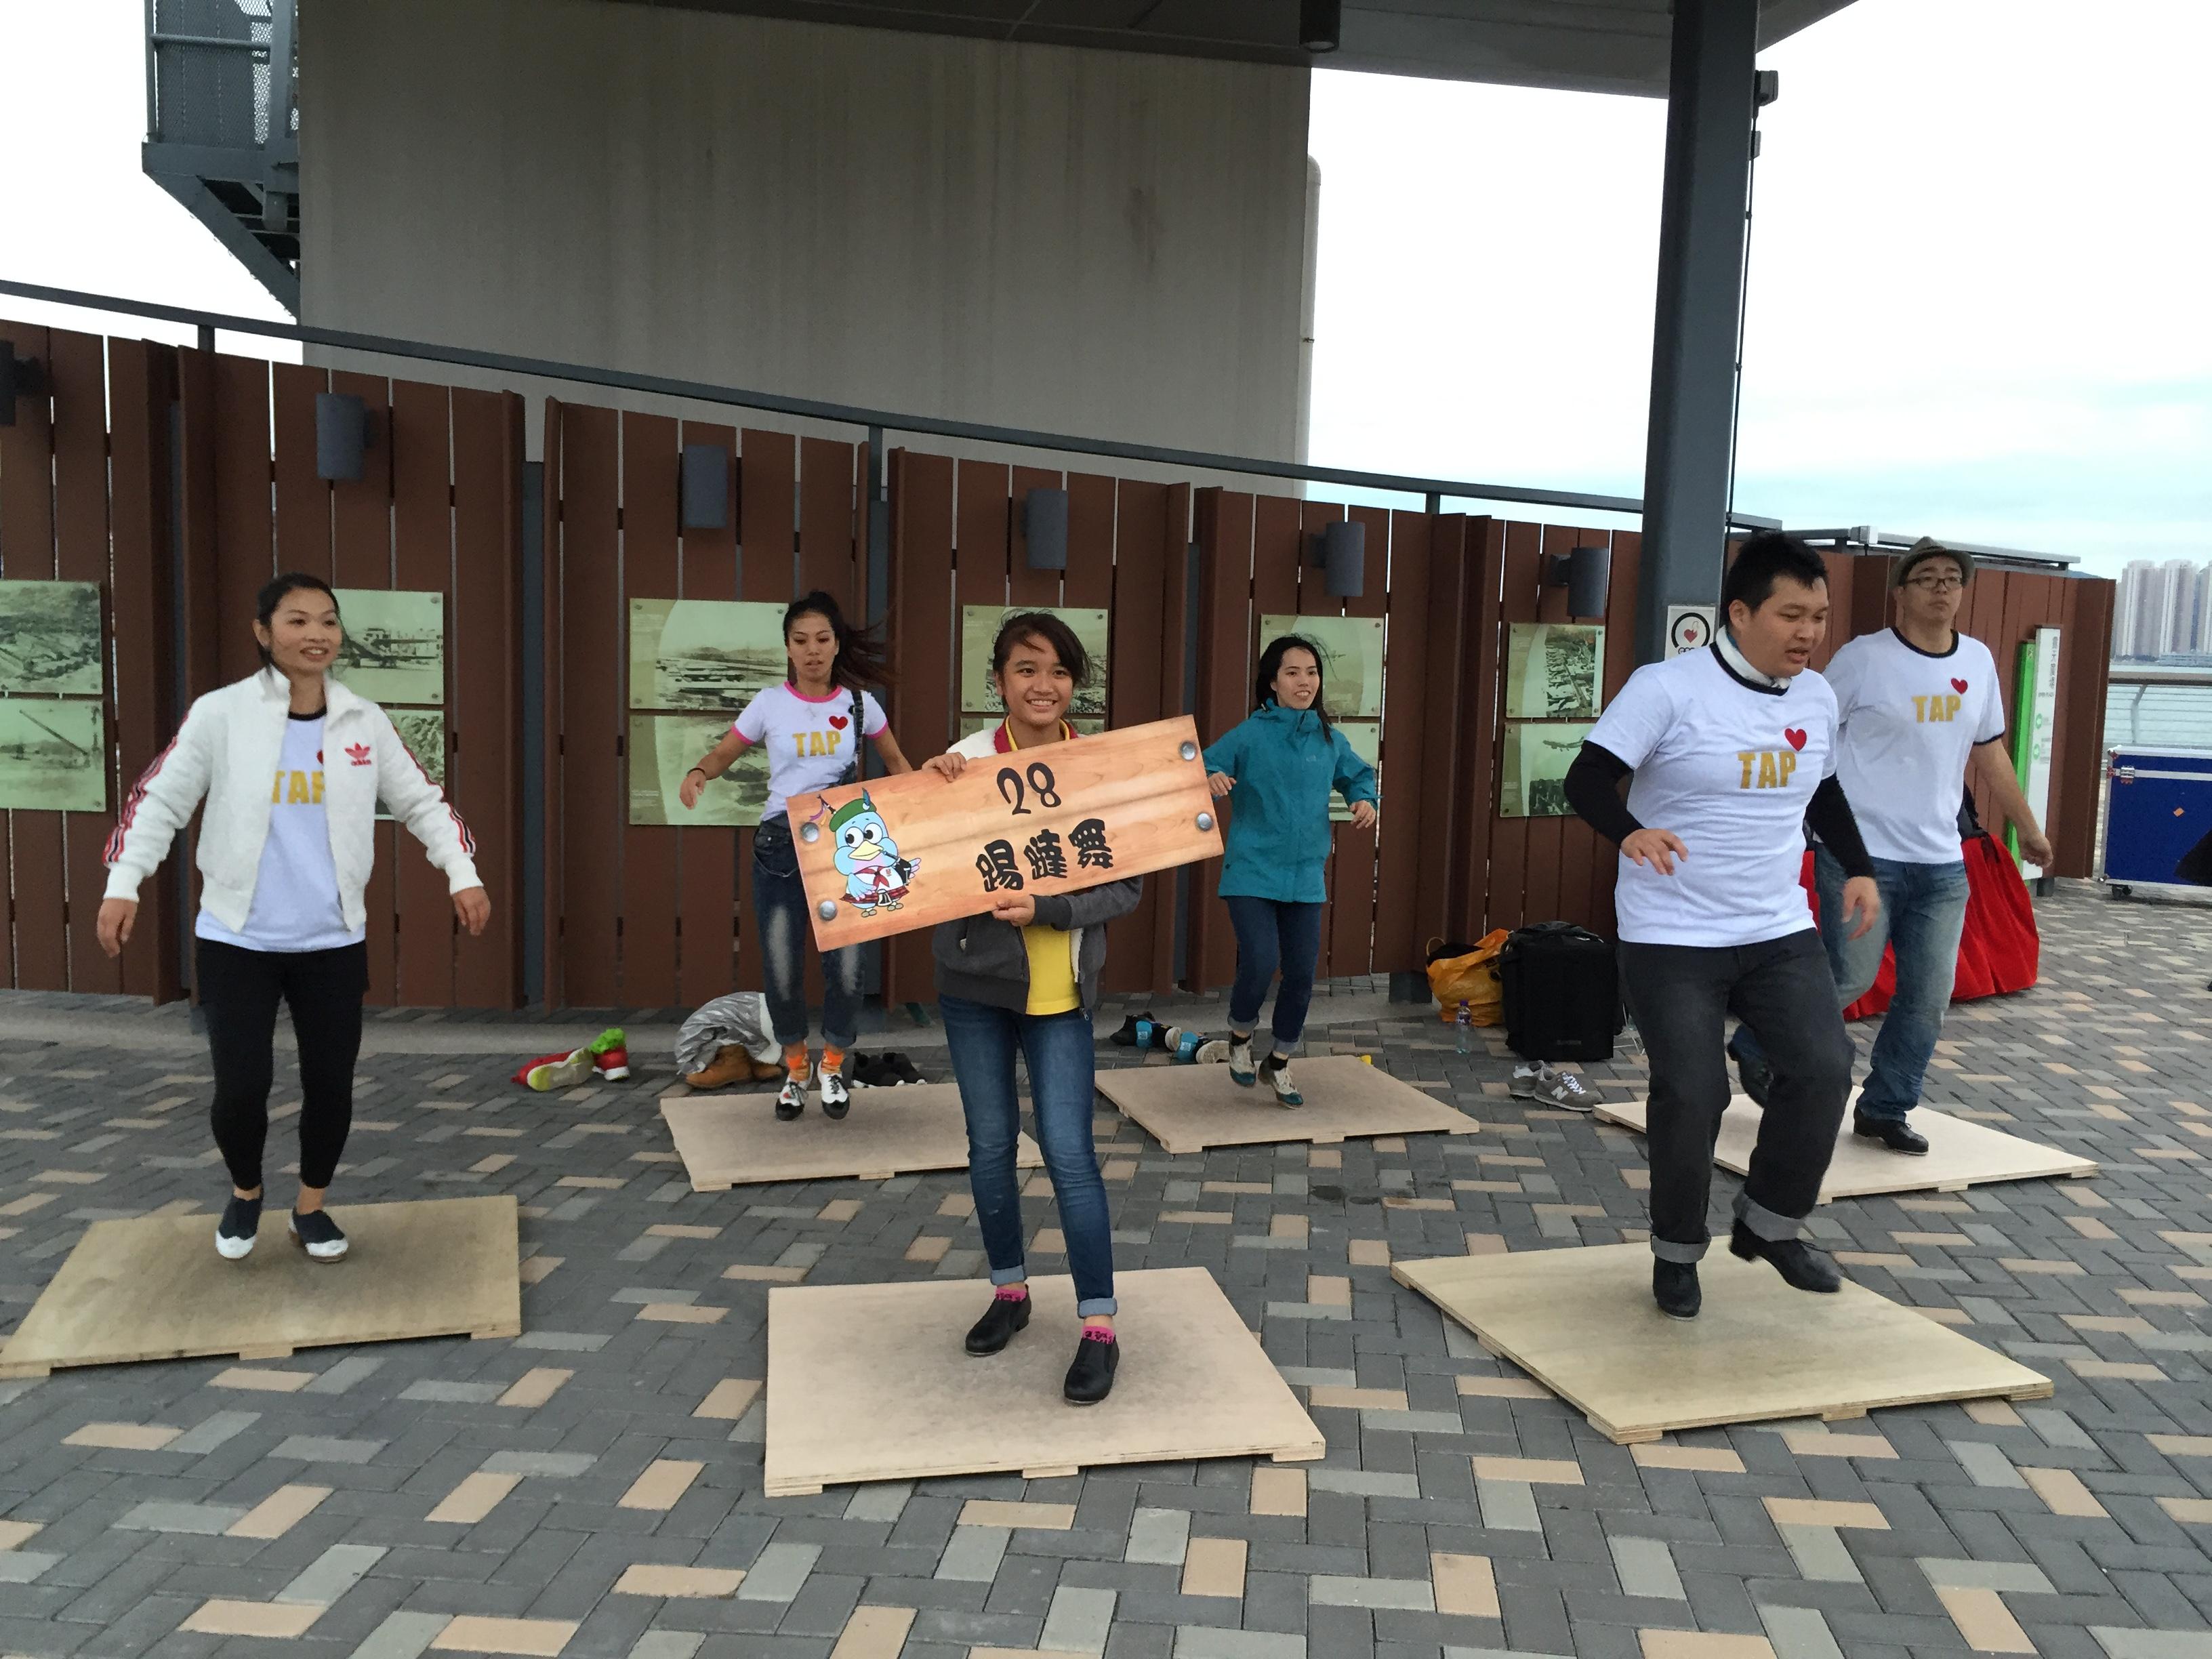 Tap Dance Demonstration